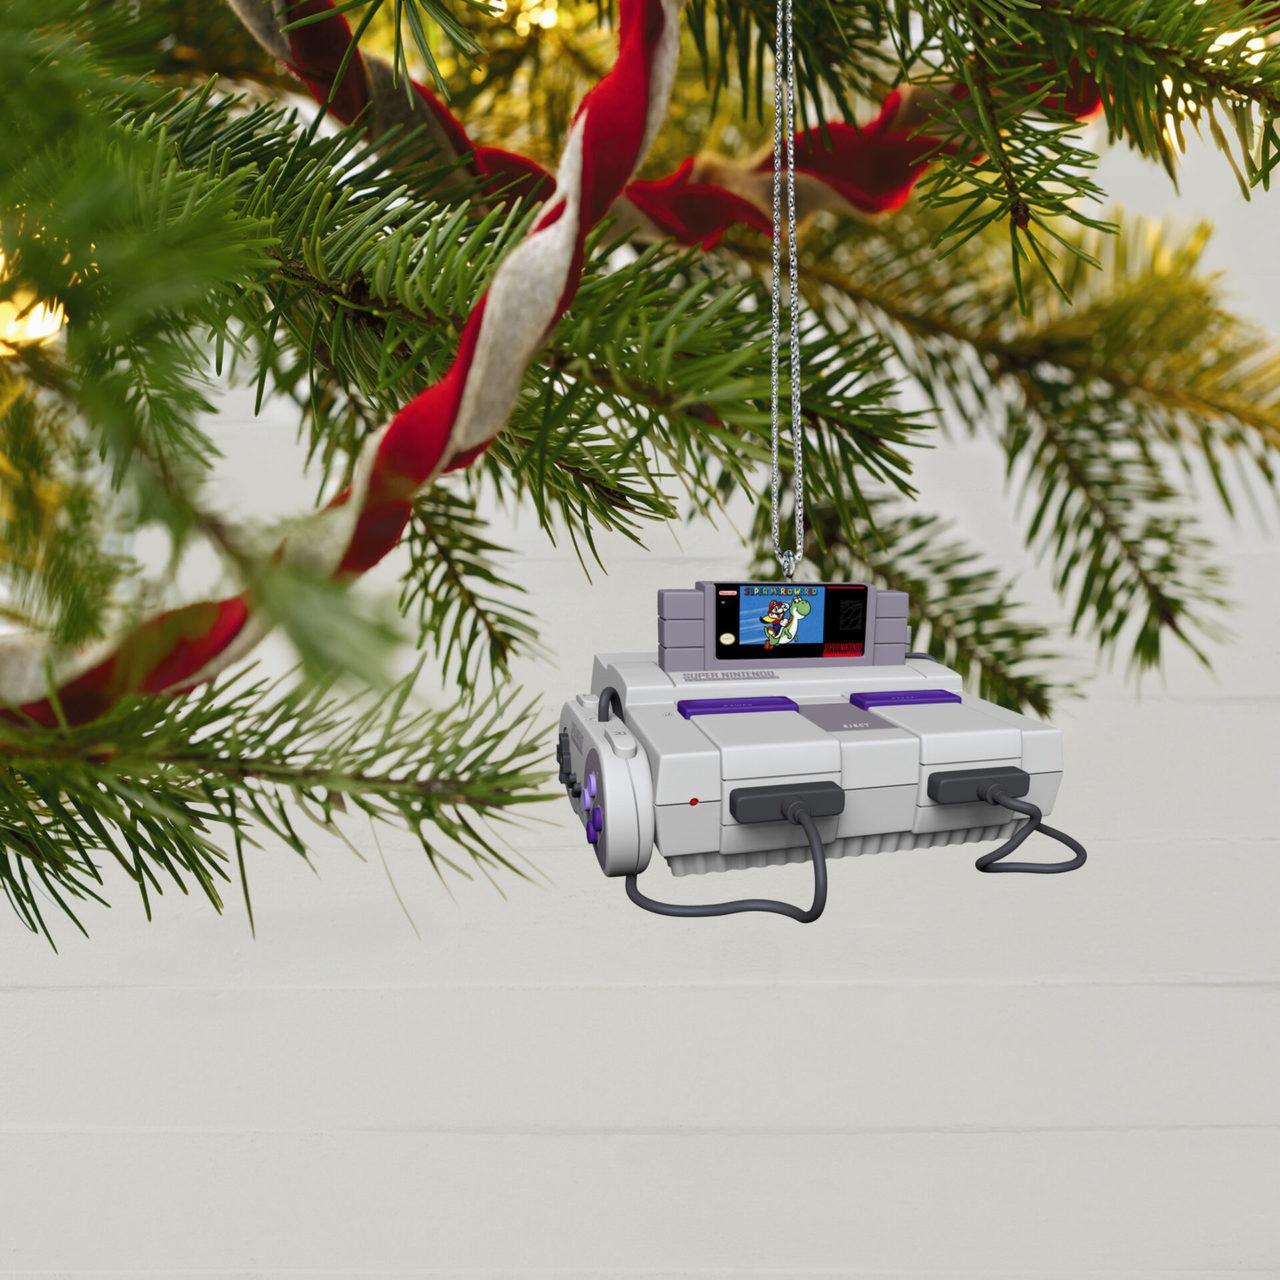 Nintendo-Super-NES-Console-Keepsake-Ornament-With-Light-and-Sound_1999QXI7442_02